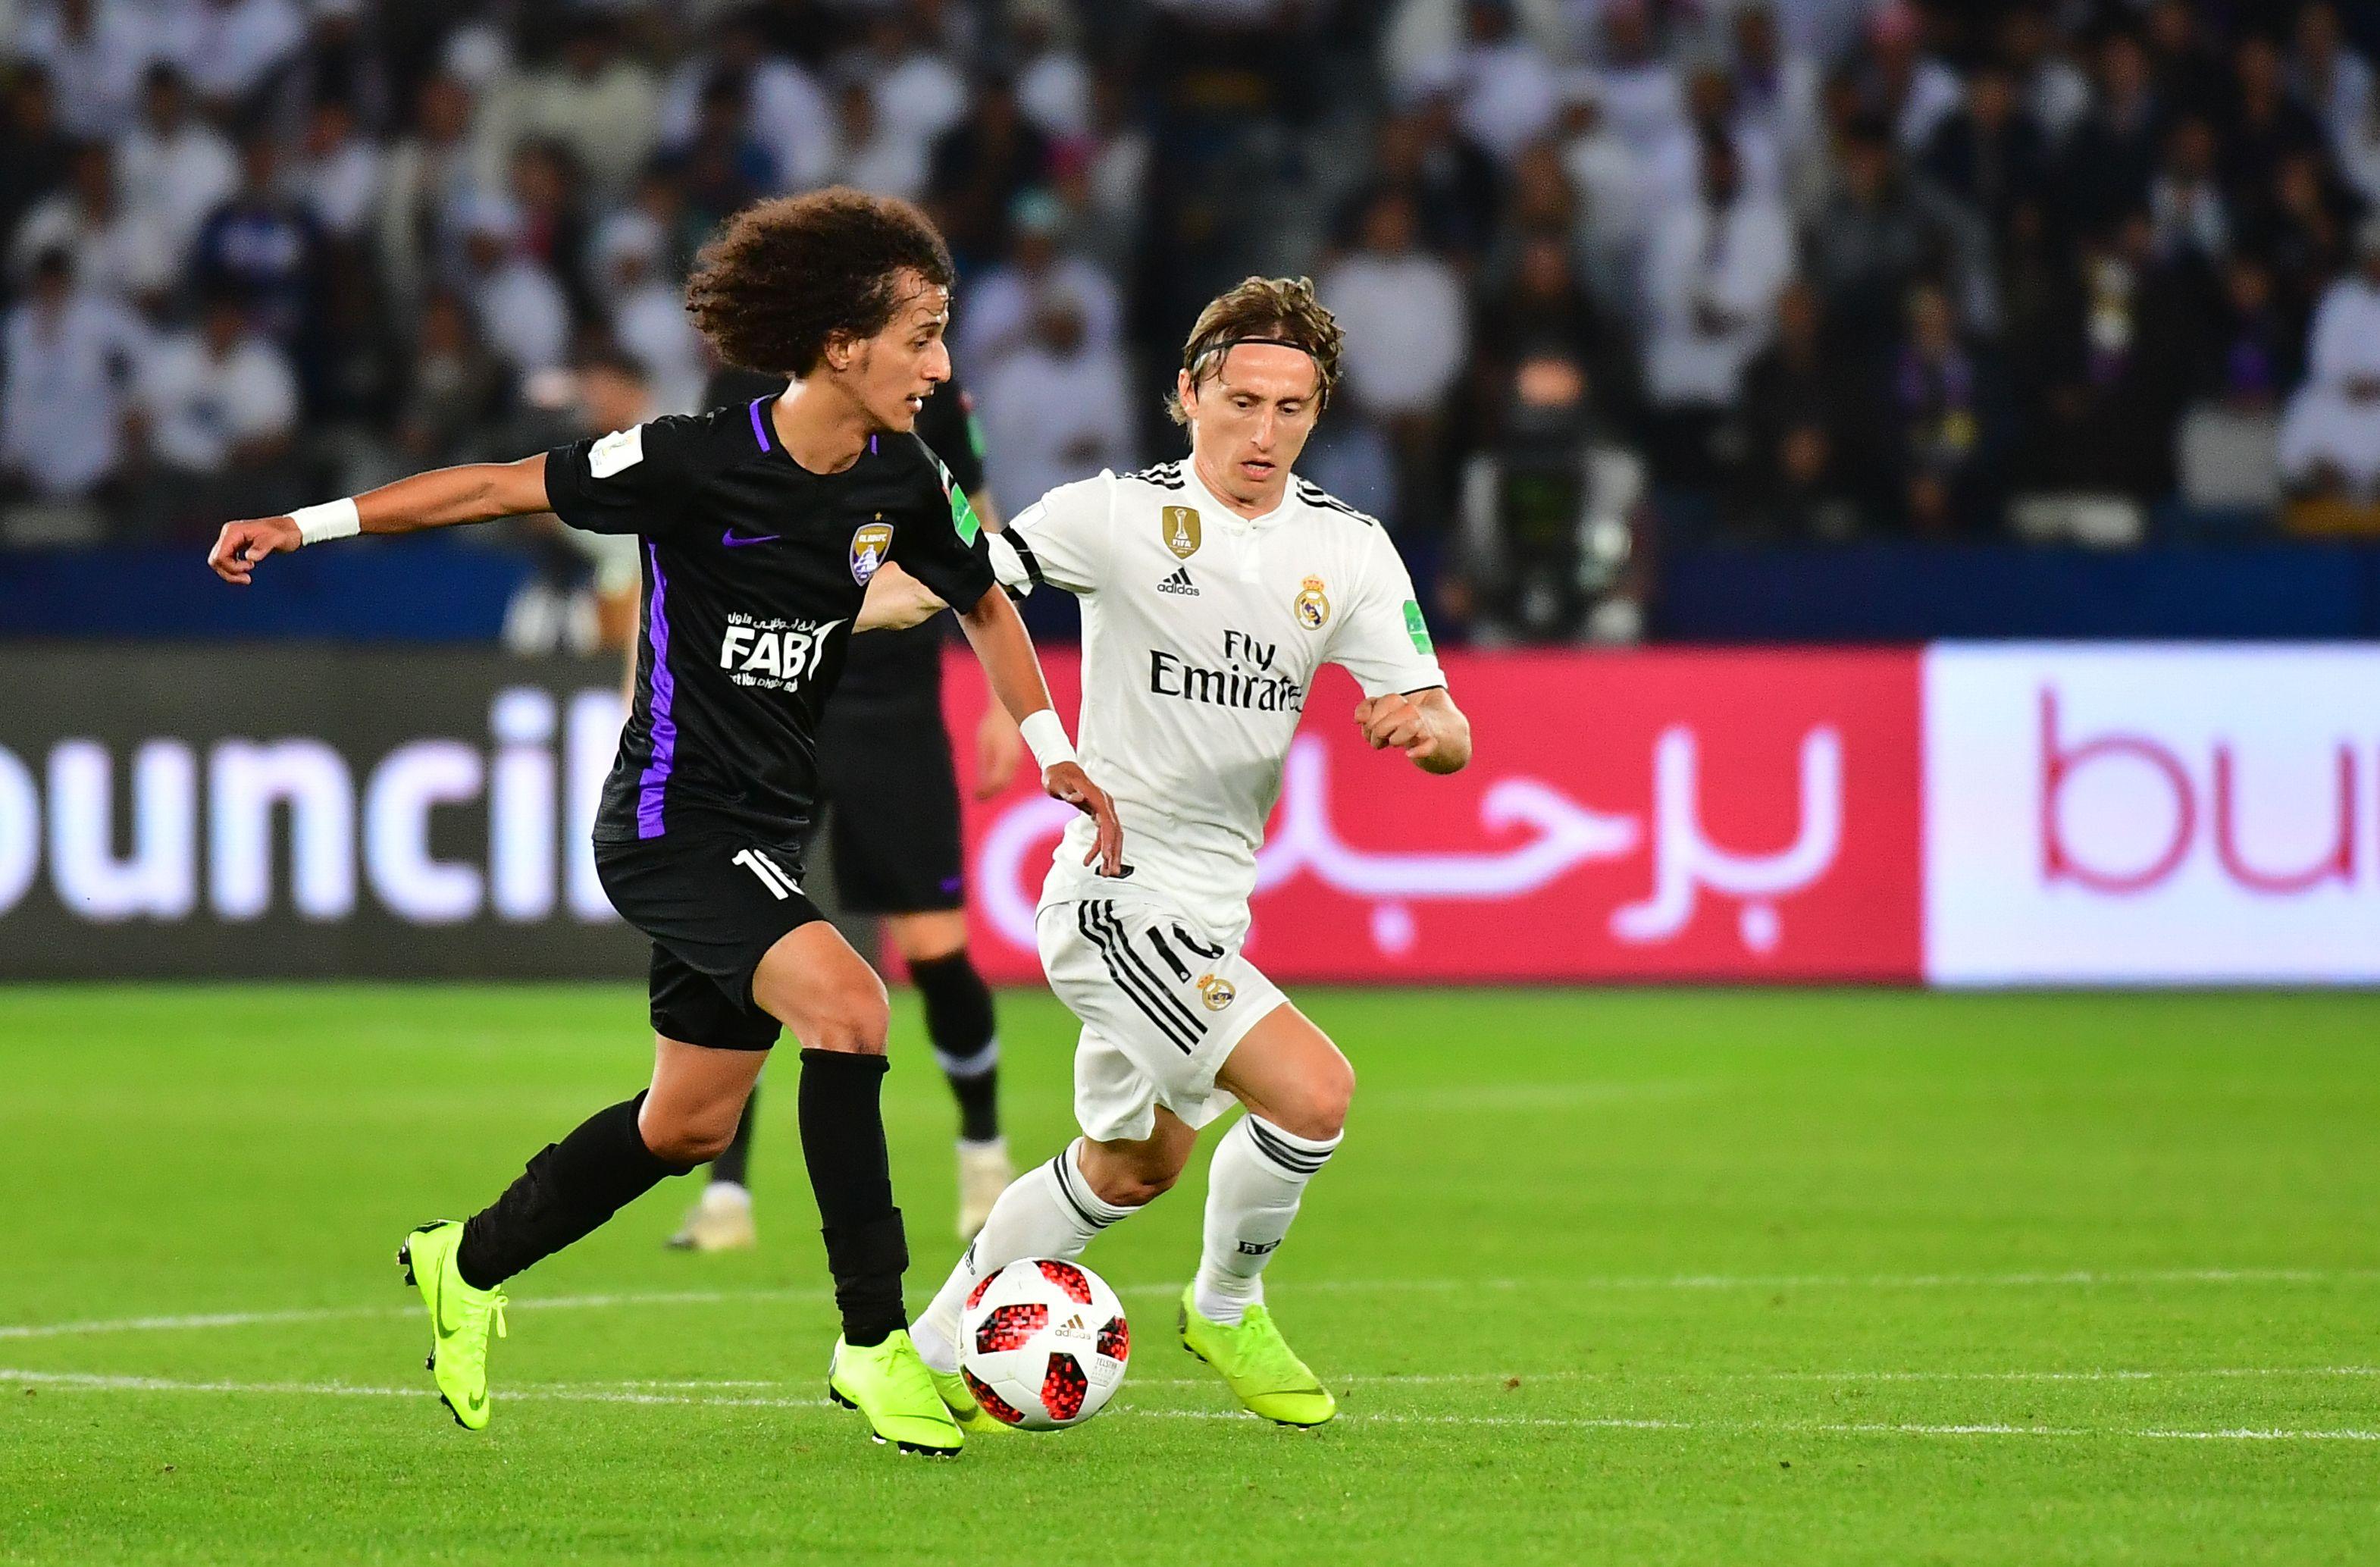 Mohamed Abdulrahman & Luka Modrić - Al Ain v Real Madrid